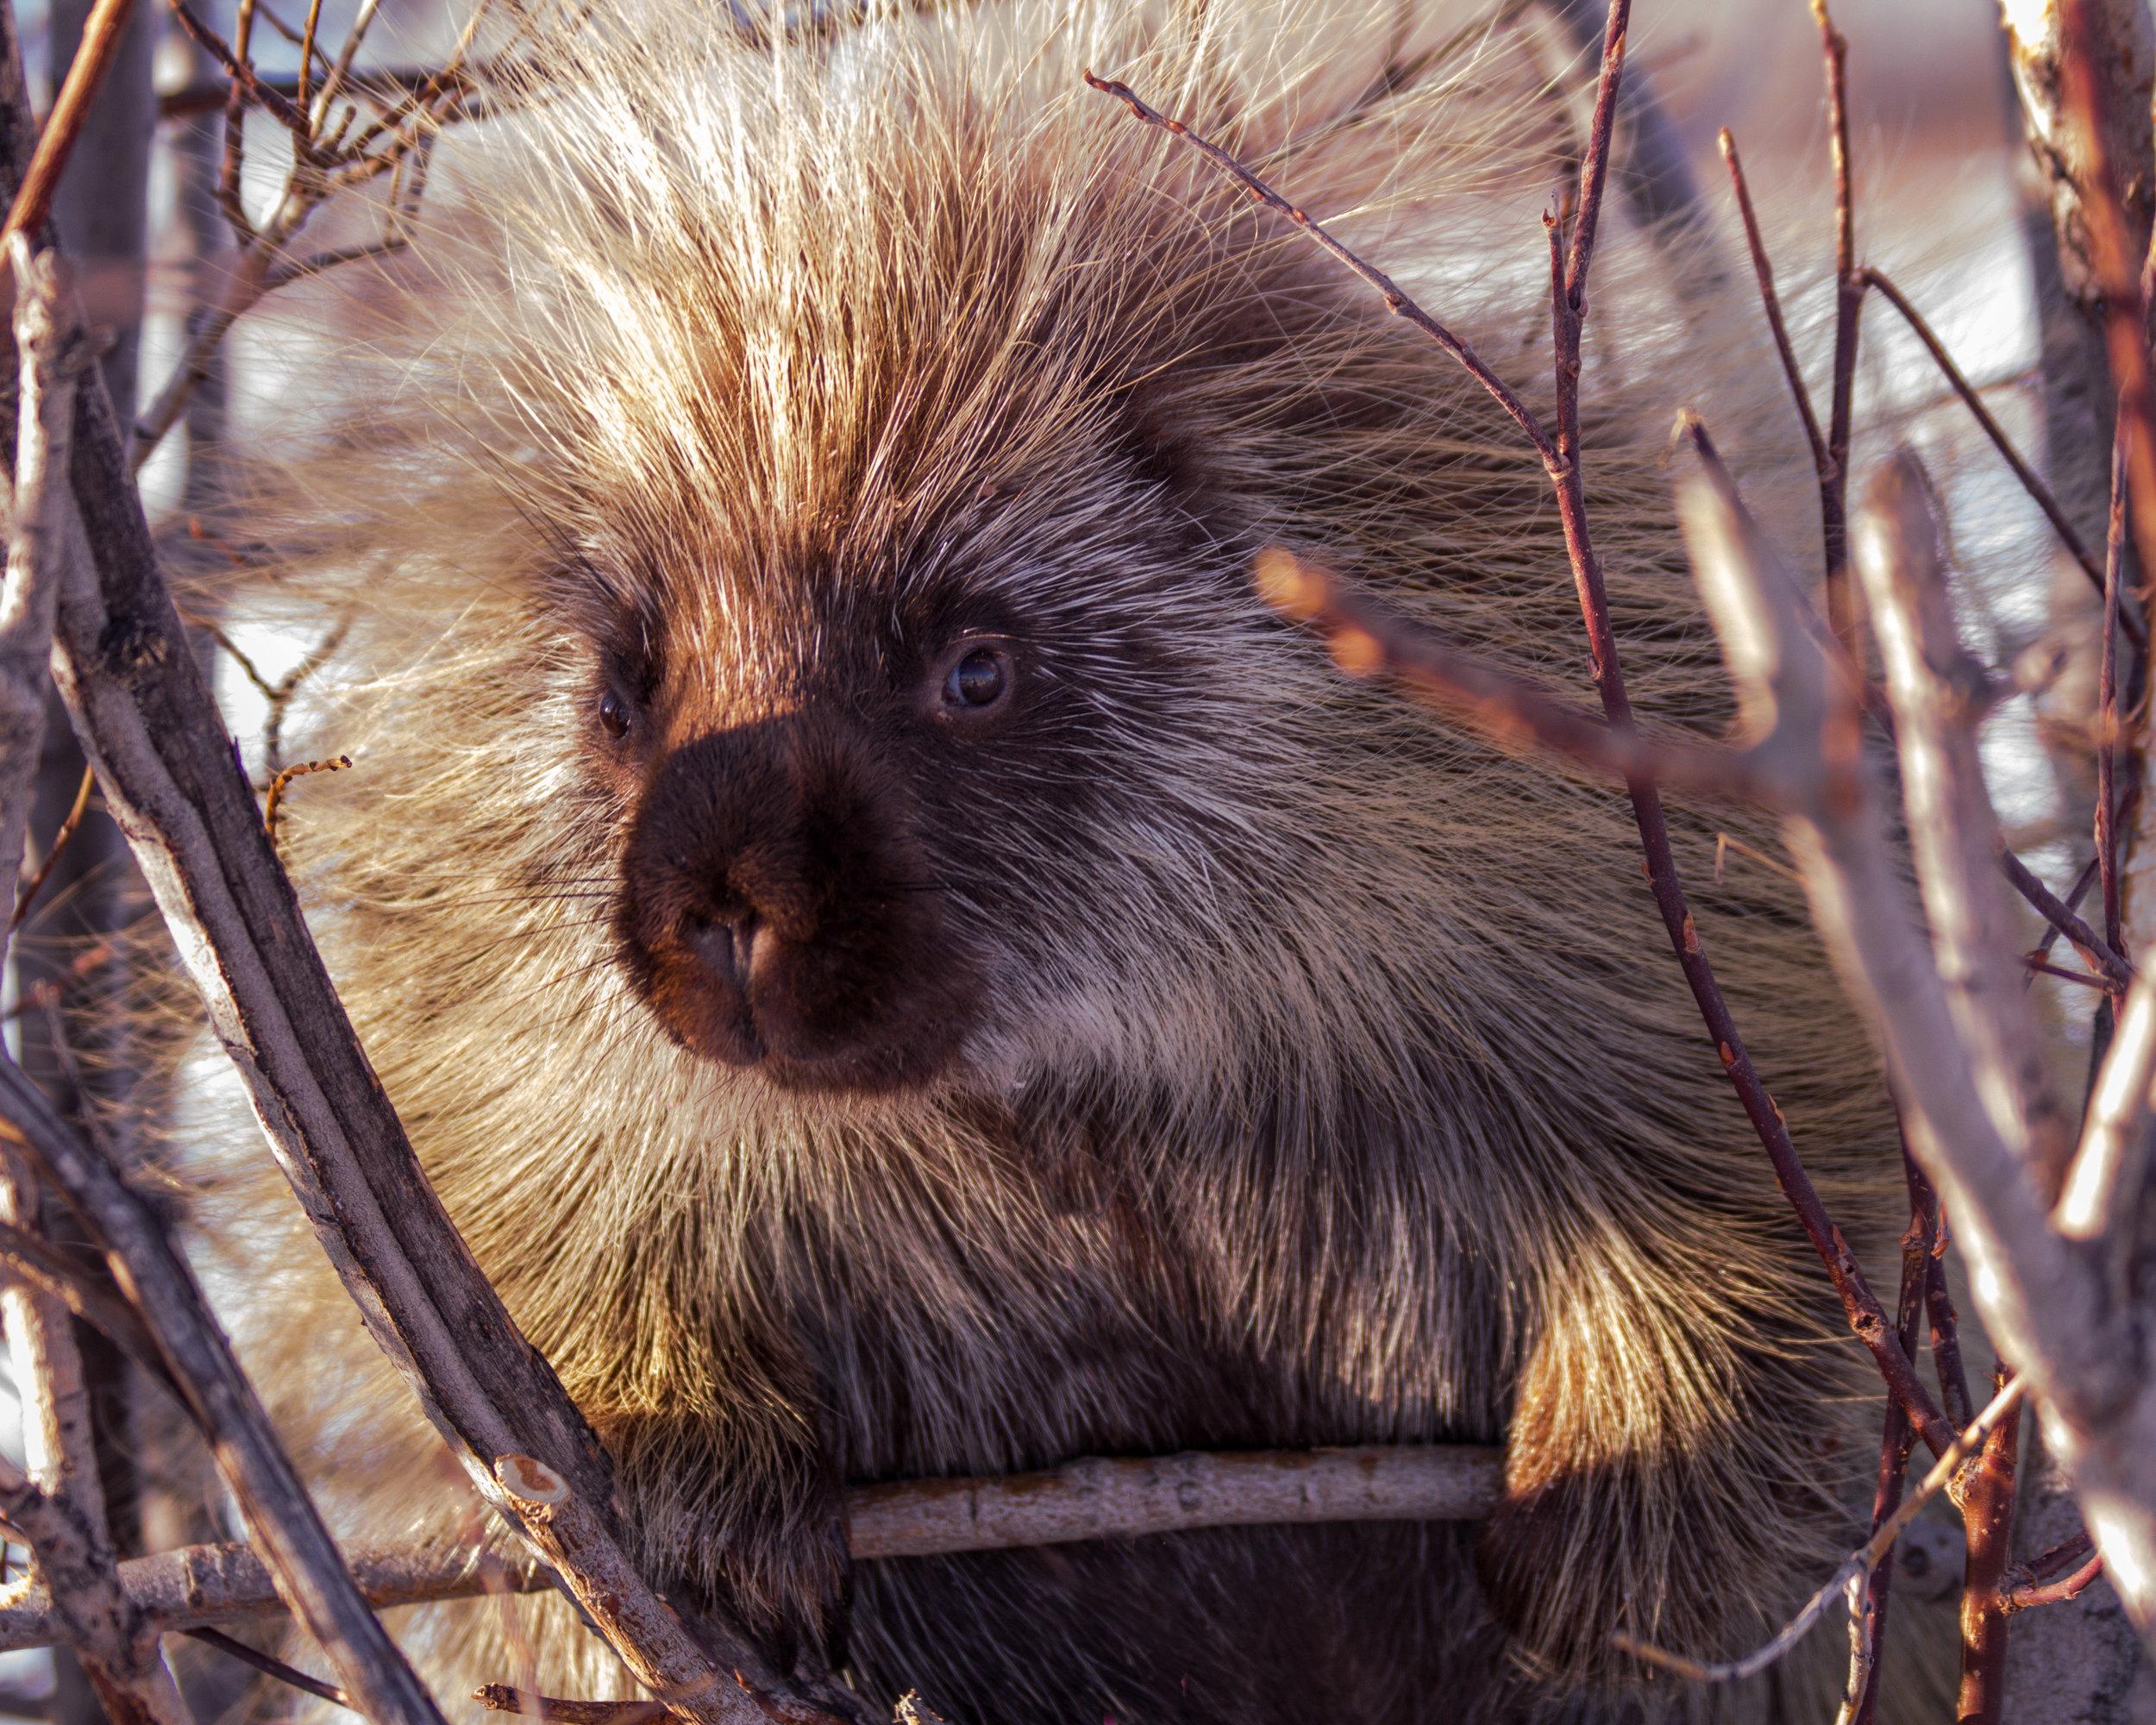 porcupine_Heidi Schuyt.jpg